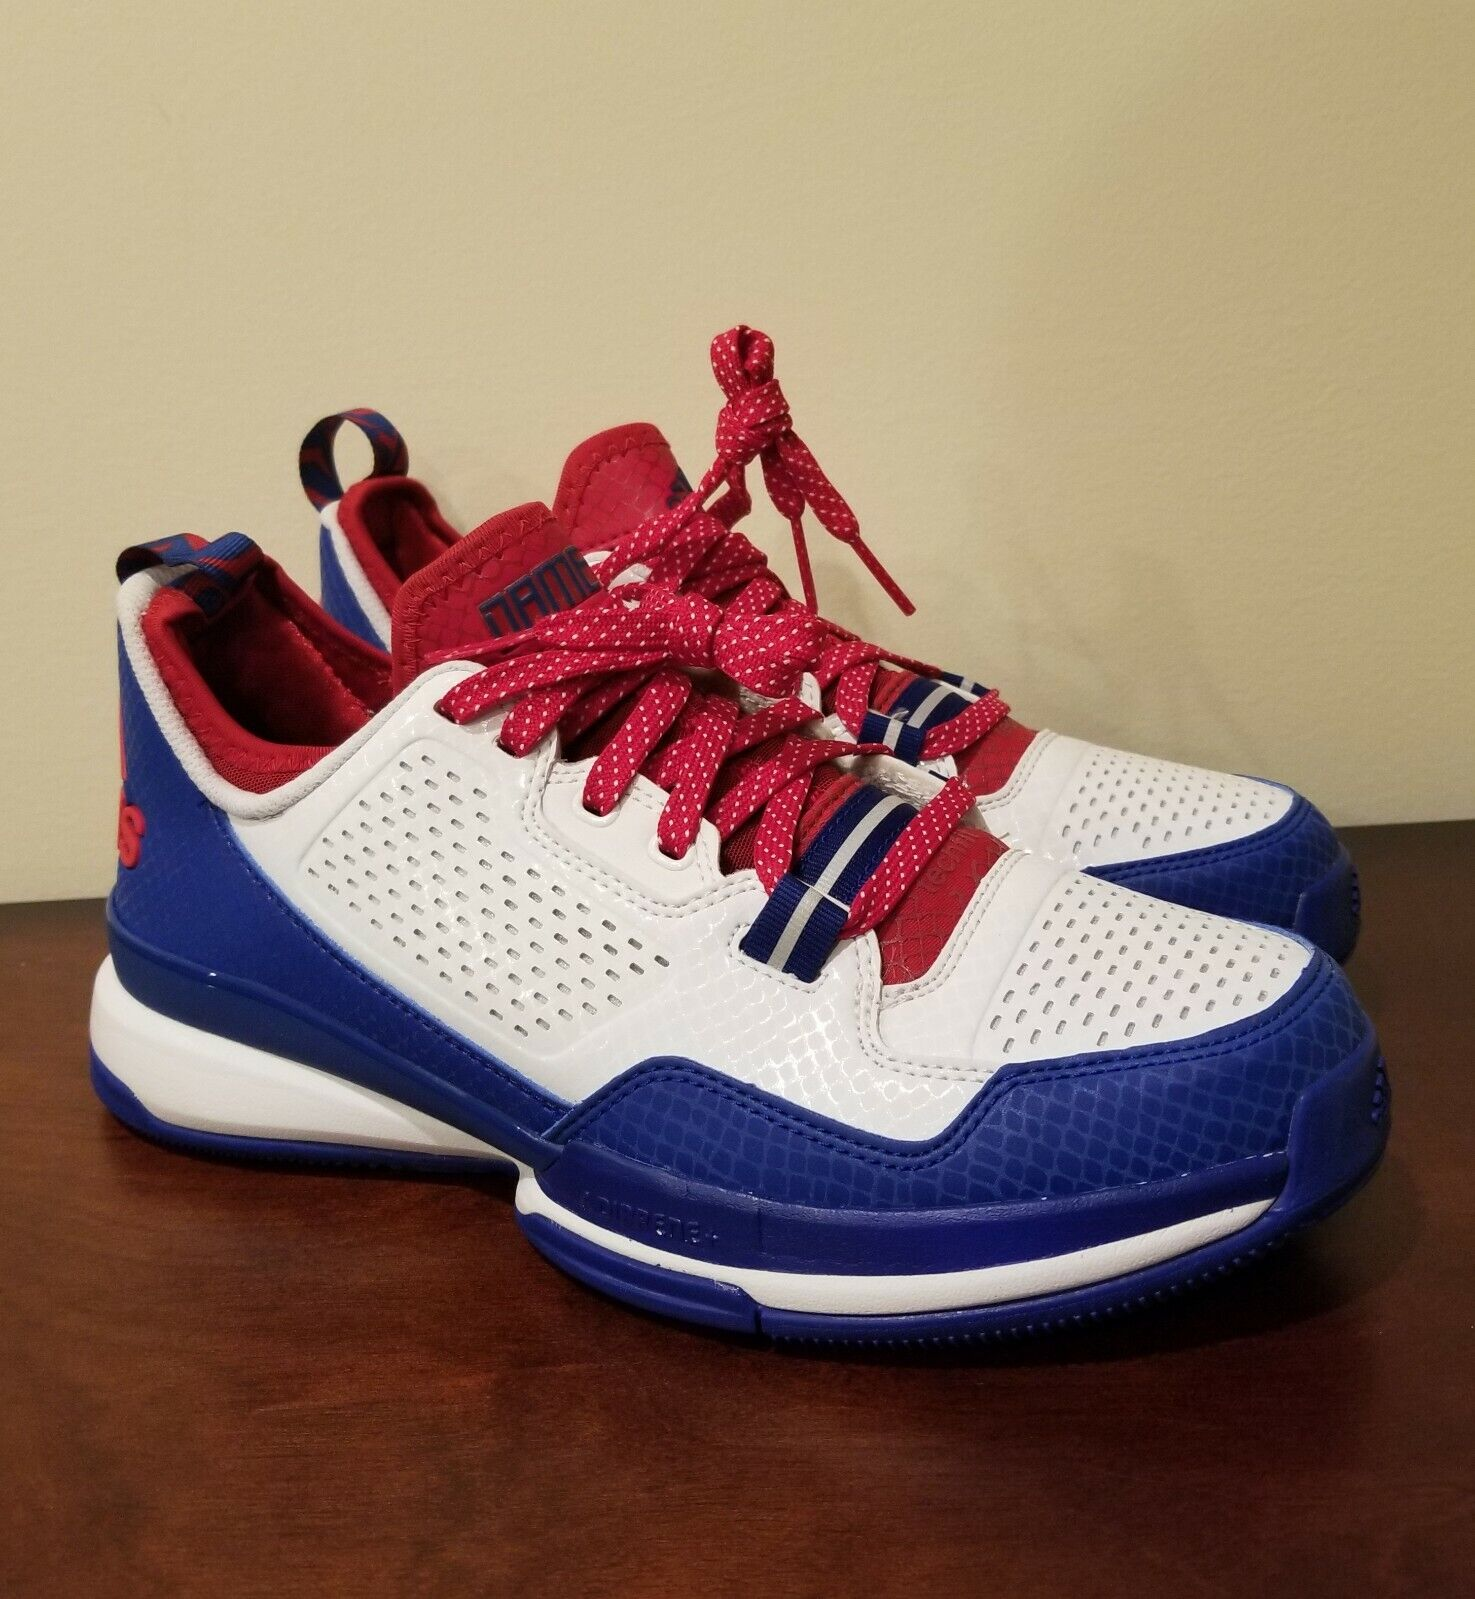 adidas D Lillard 1 Forestry Basketball